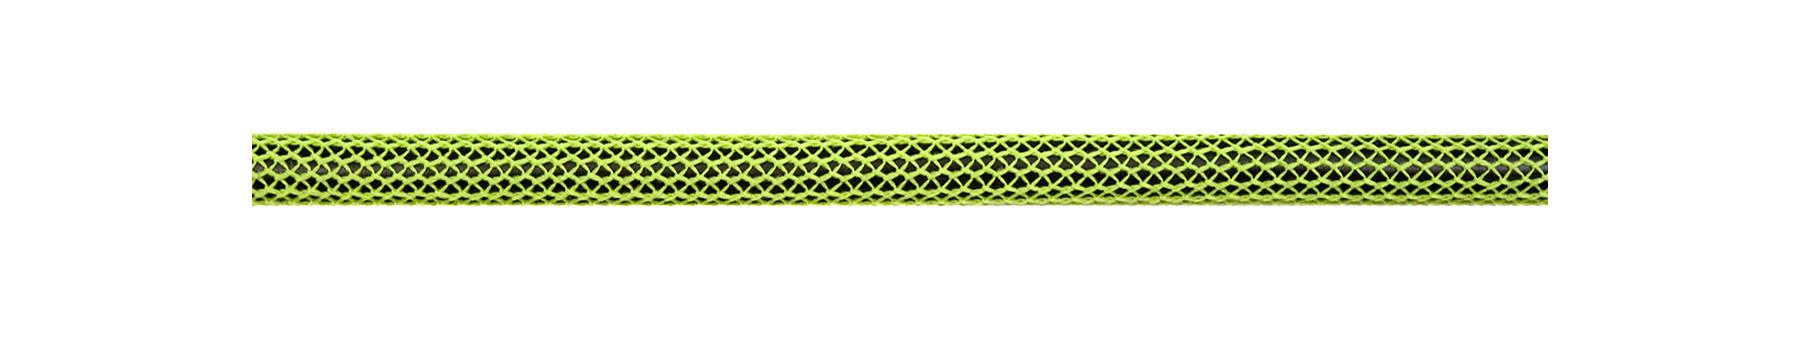 Textilkabel Neon Grün/Schwarz Netzartiger Textilmantel